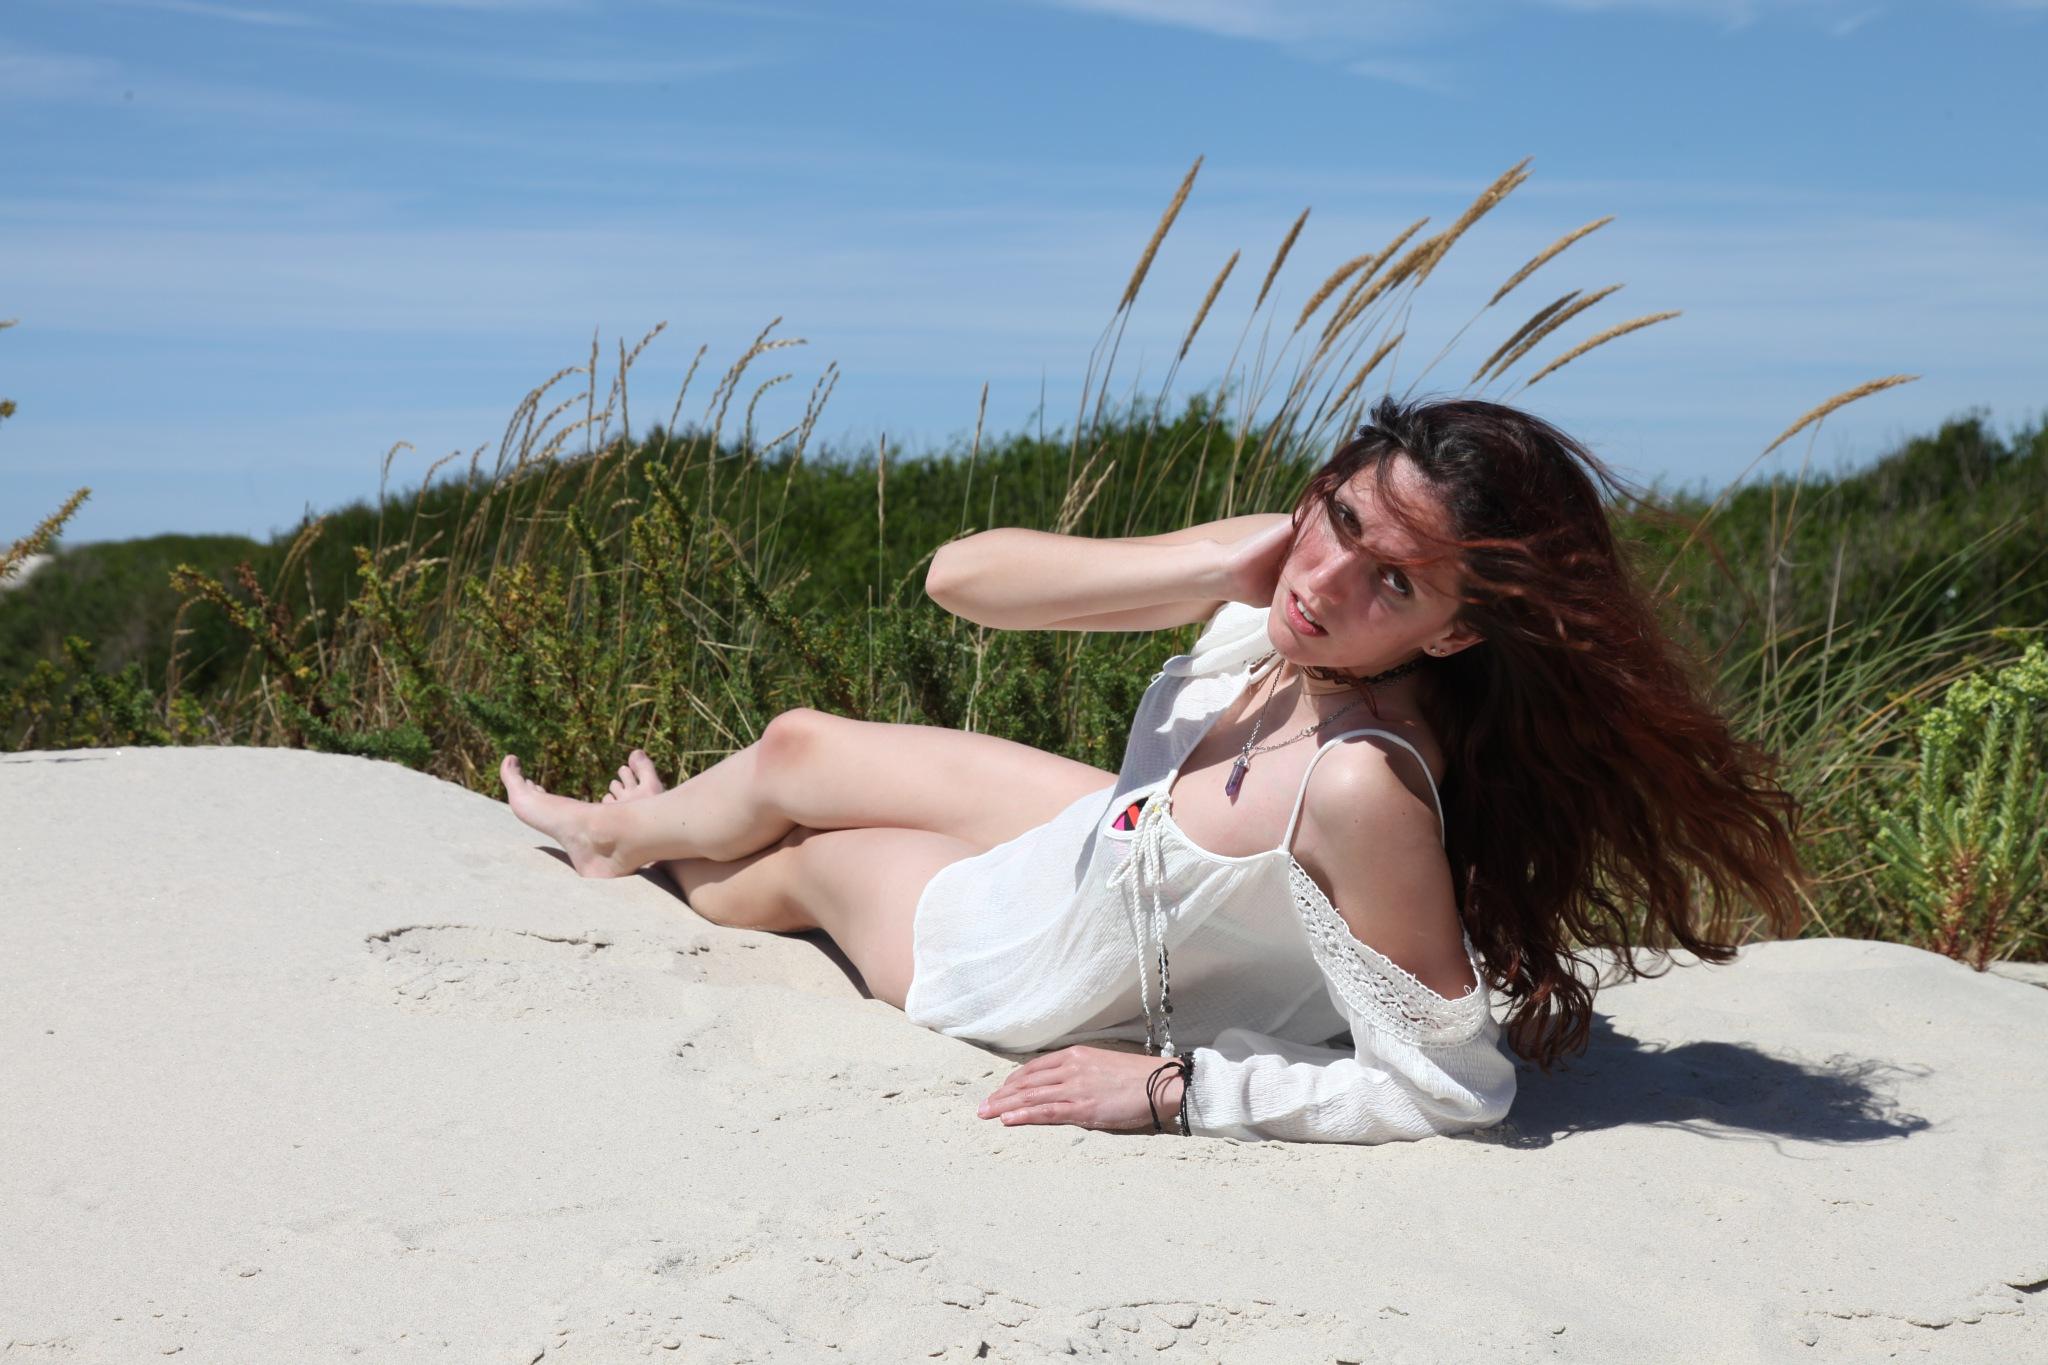 Windy Beach by Rafael Dias